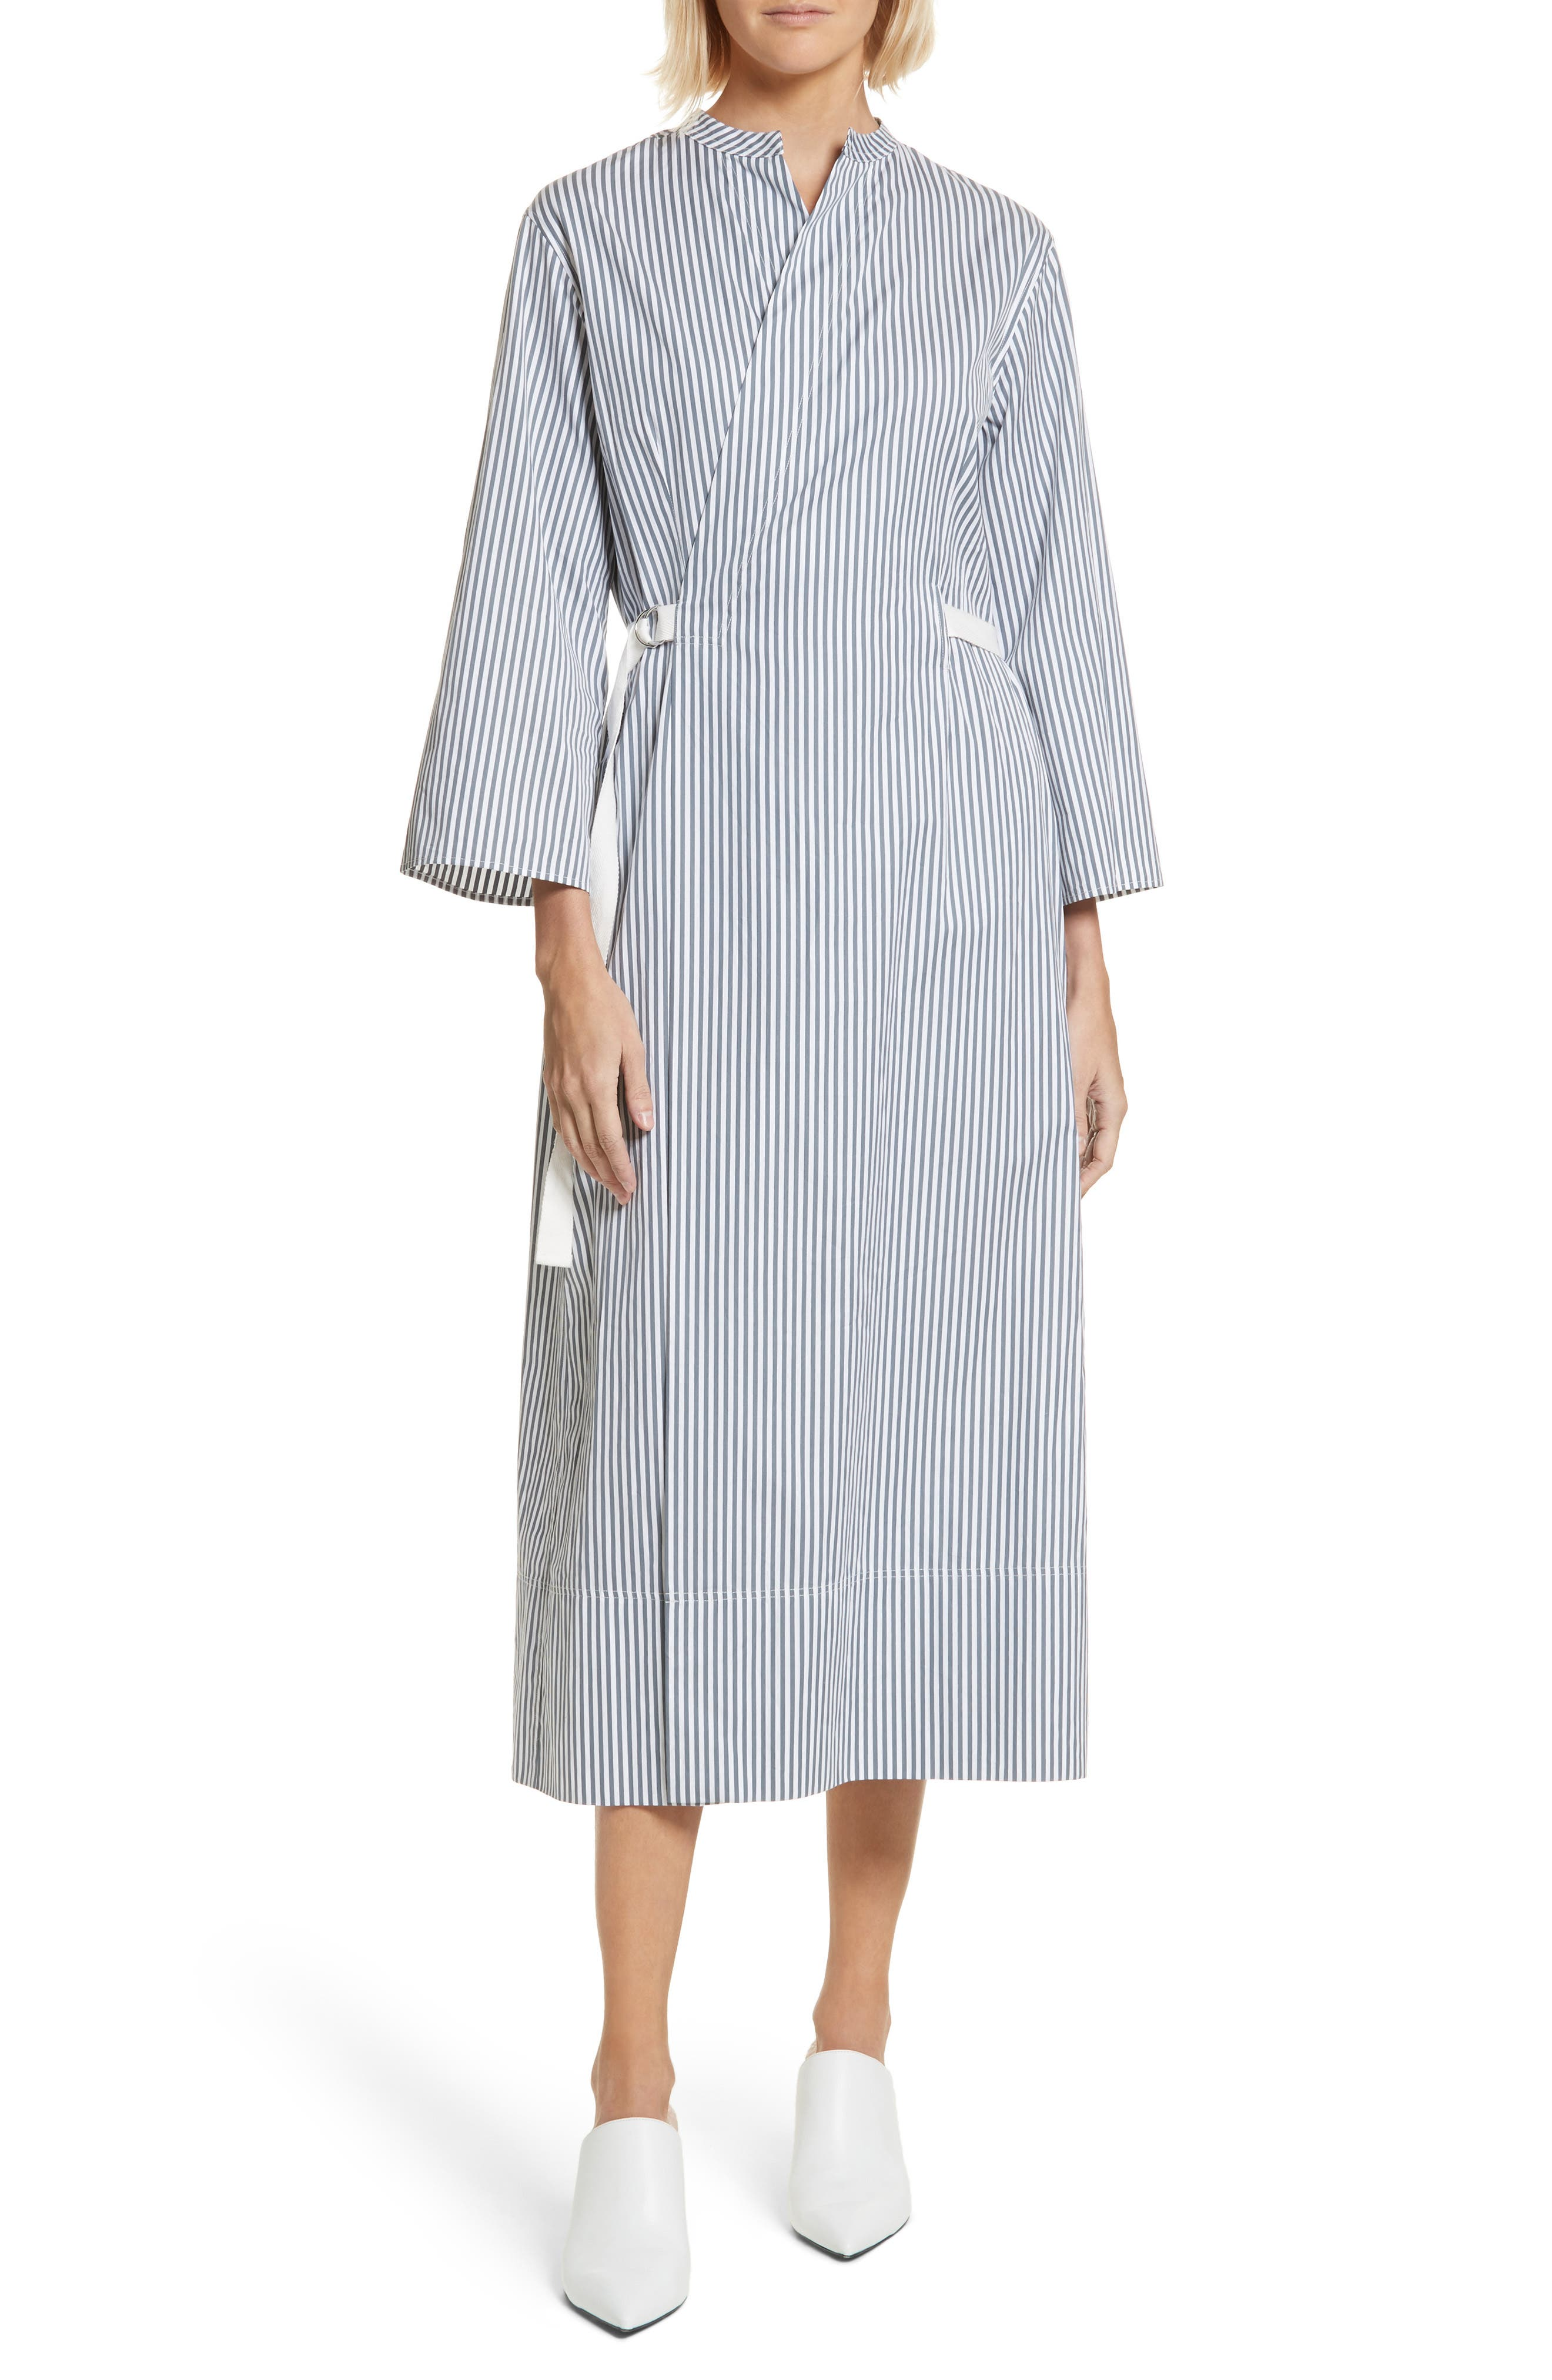 Candy Stripe Midi Dress,                         Main,                         color, Ink